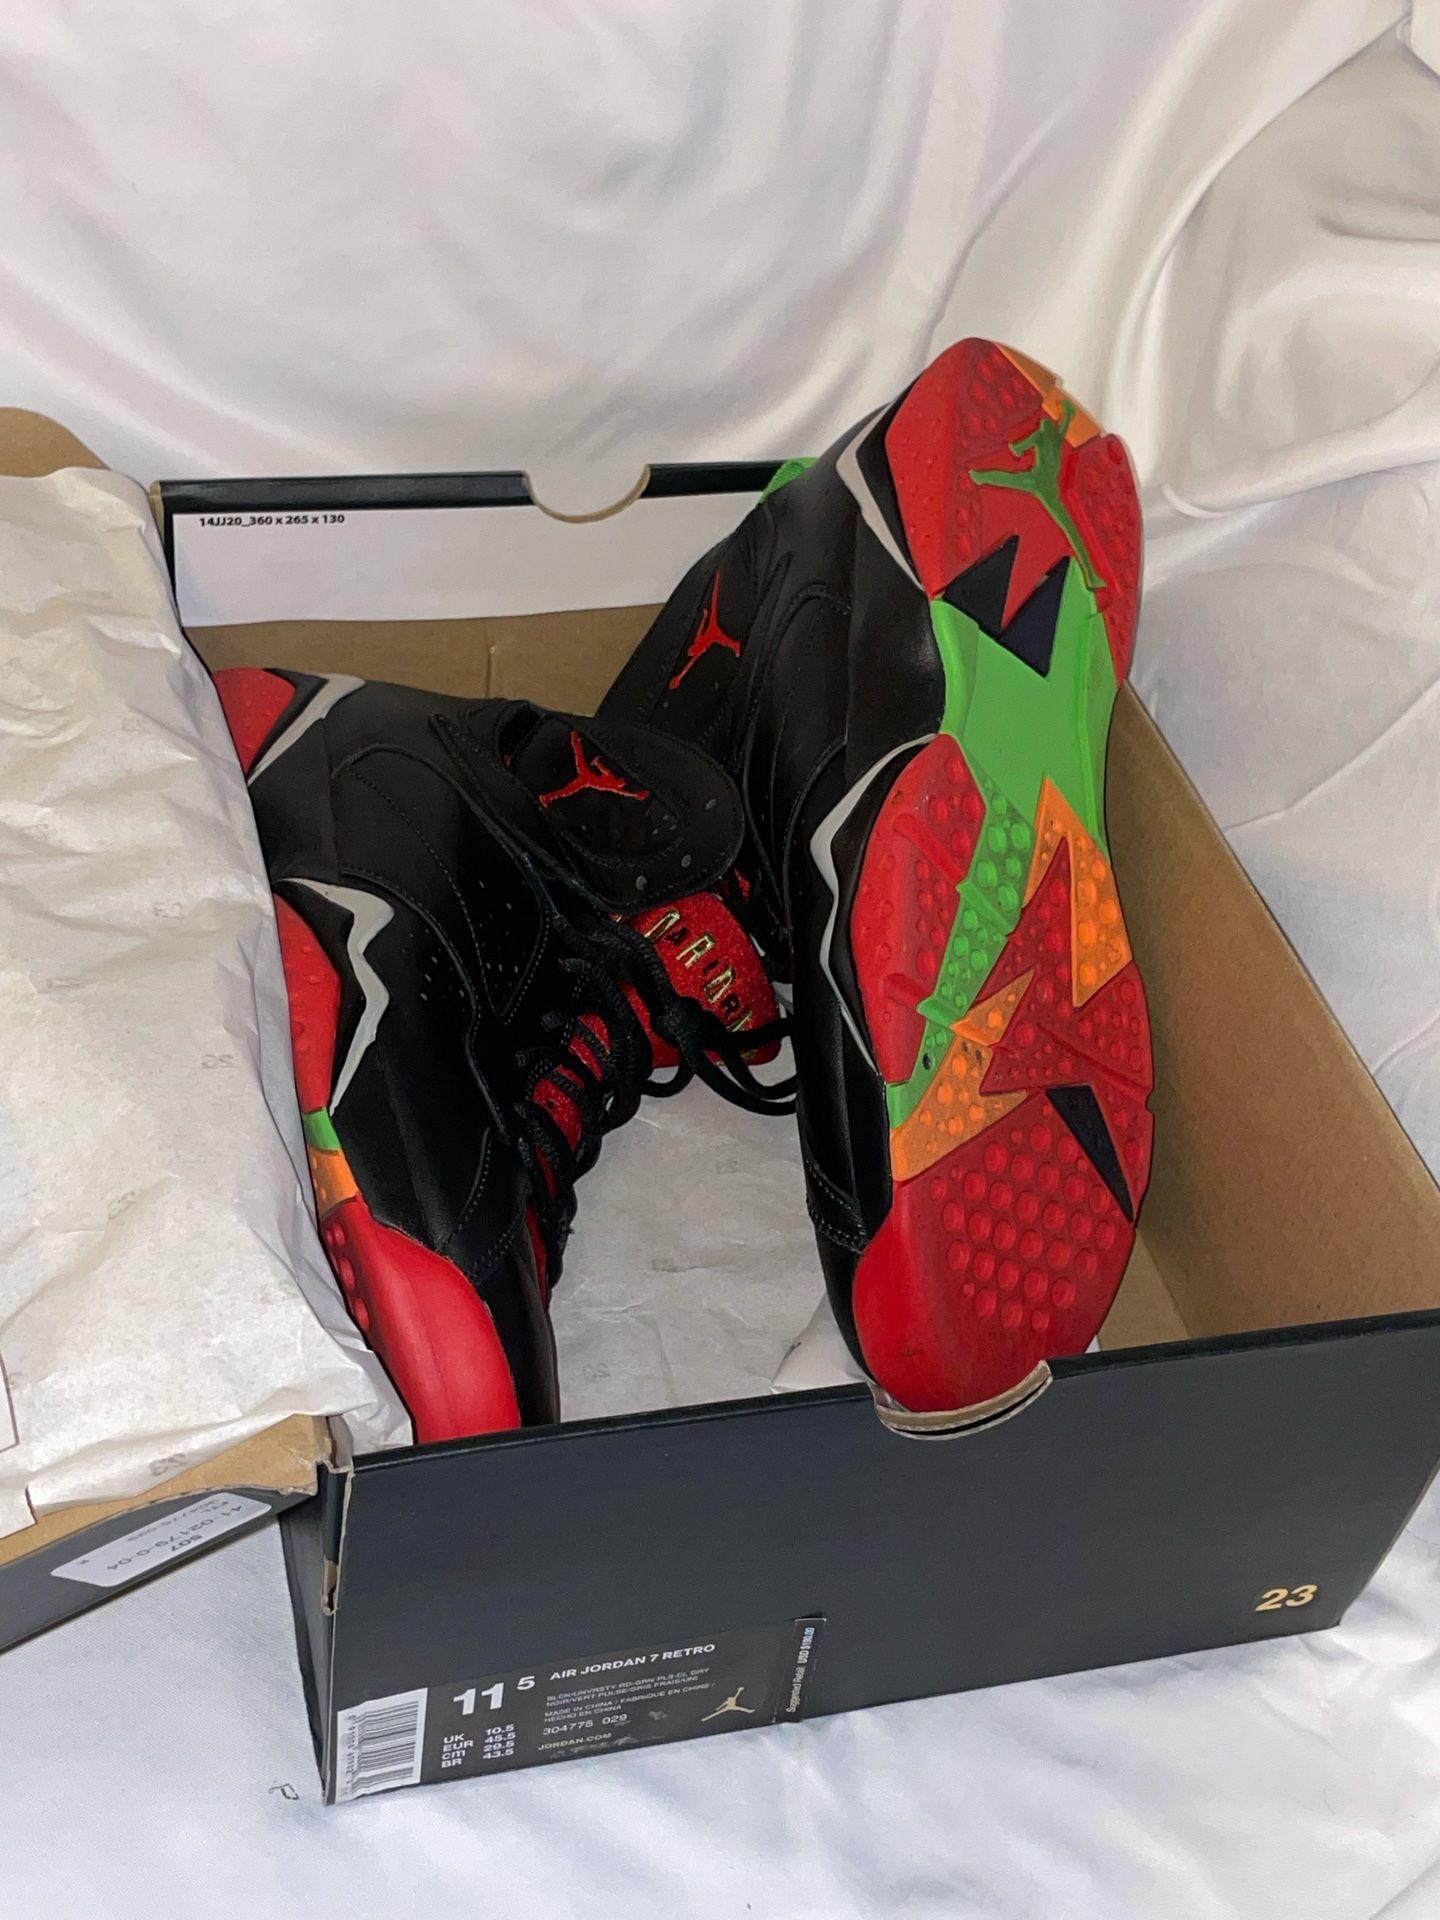 Air Jordan Retros Size-11.5